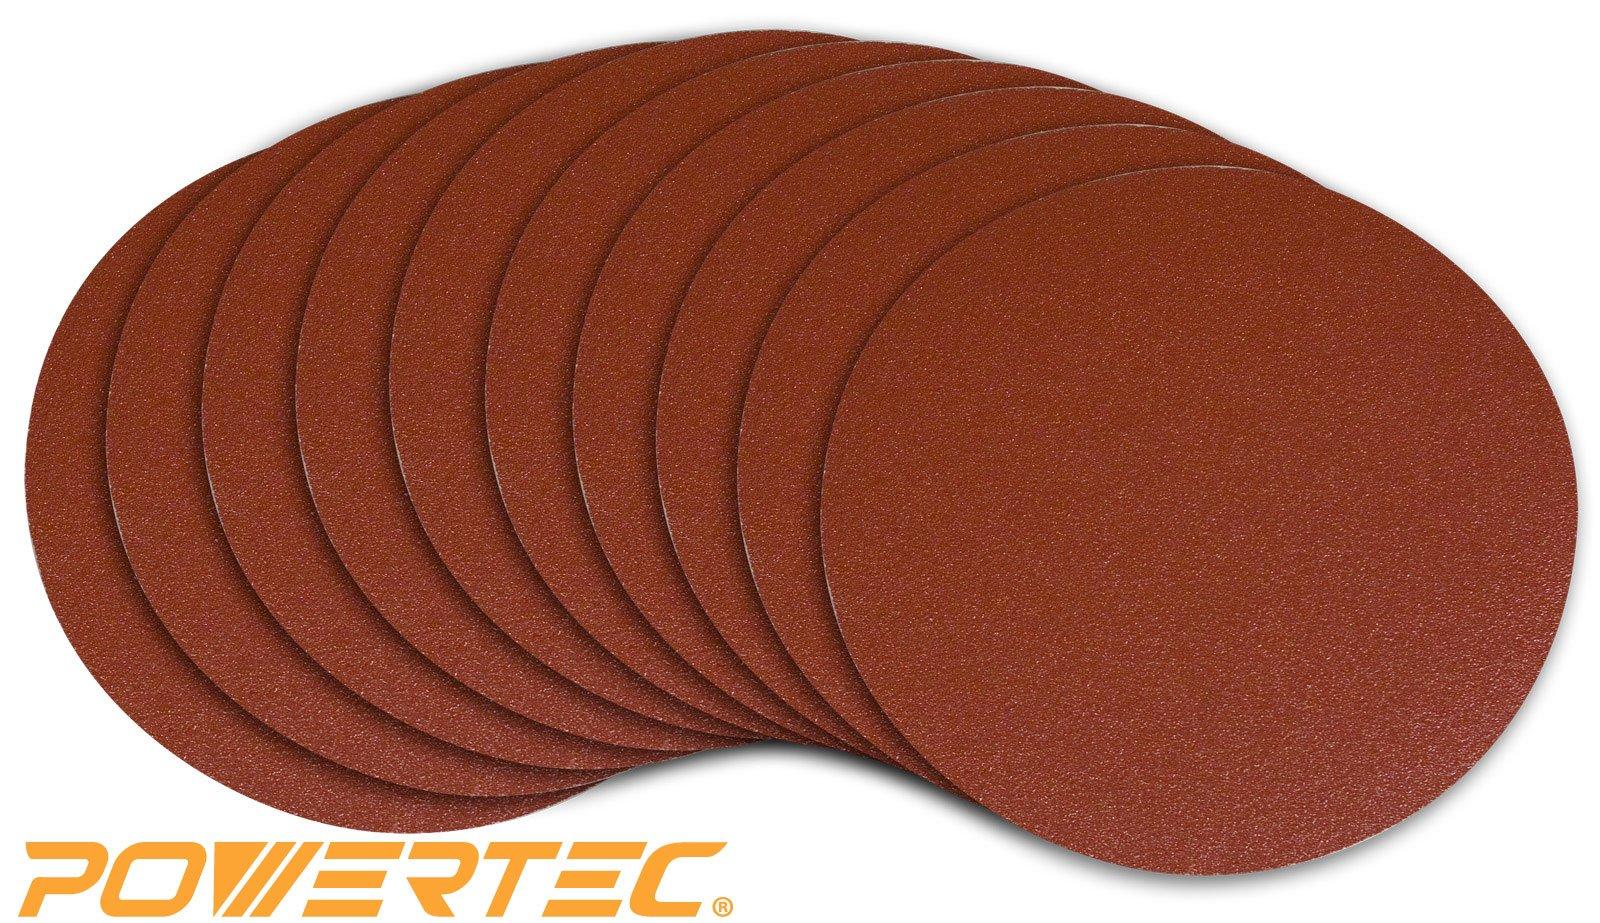 POWERTEC 110600 12-Inch PSA 80 Grit Aluminum Oxide Adhesive Sanding Disc, 10-Pack